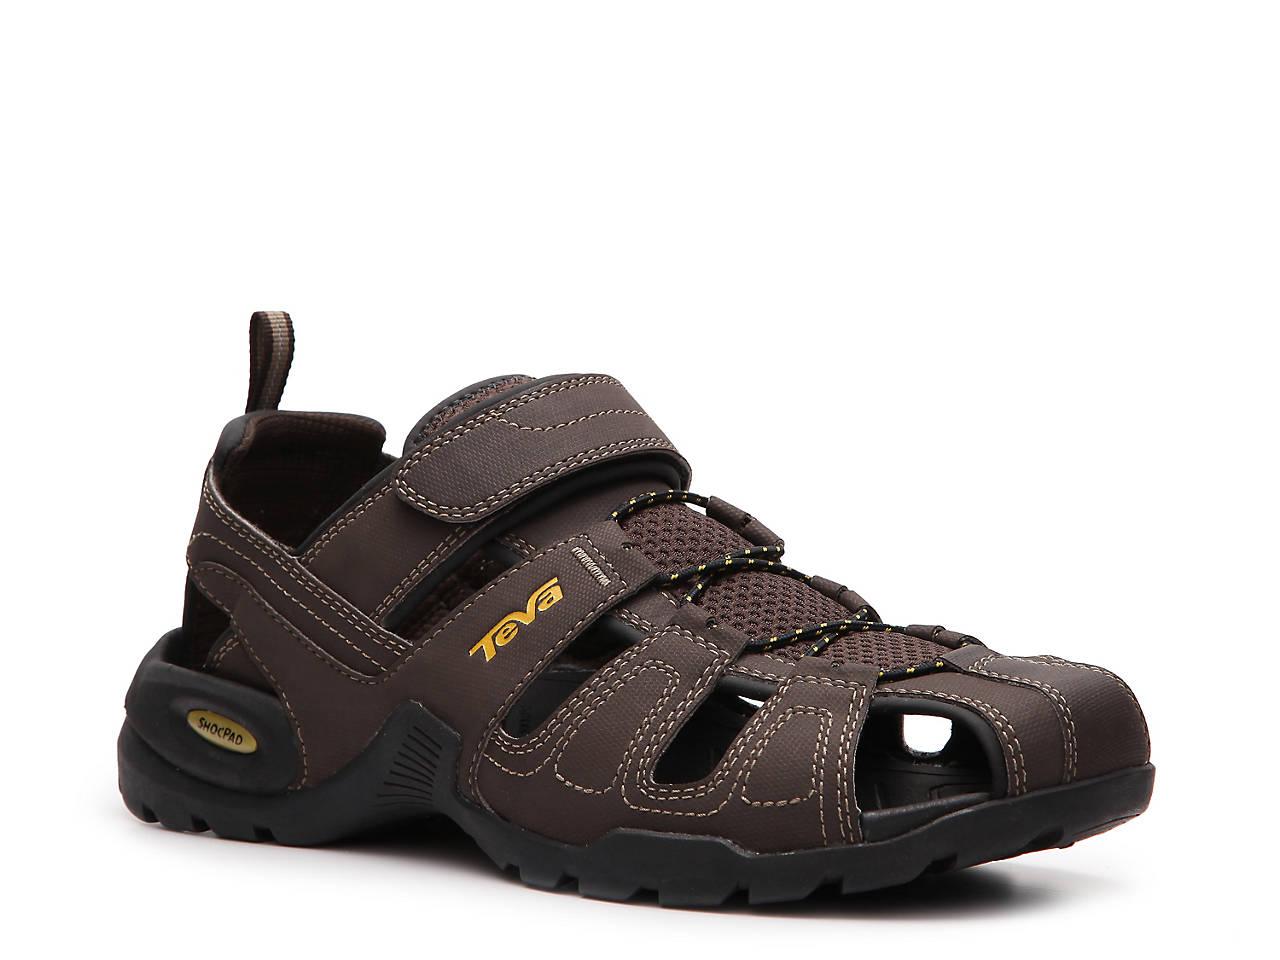 f16357f3f5c2 Teva Forebay Fisherman Sandal Men s Shoes